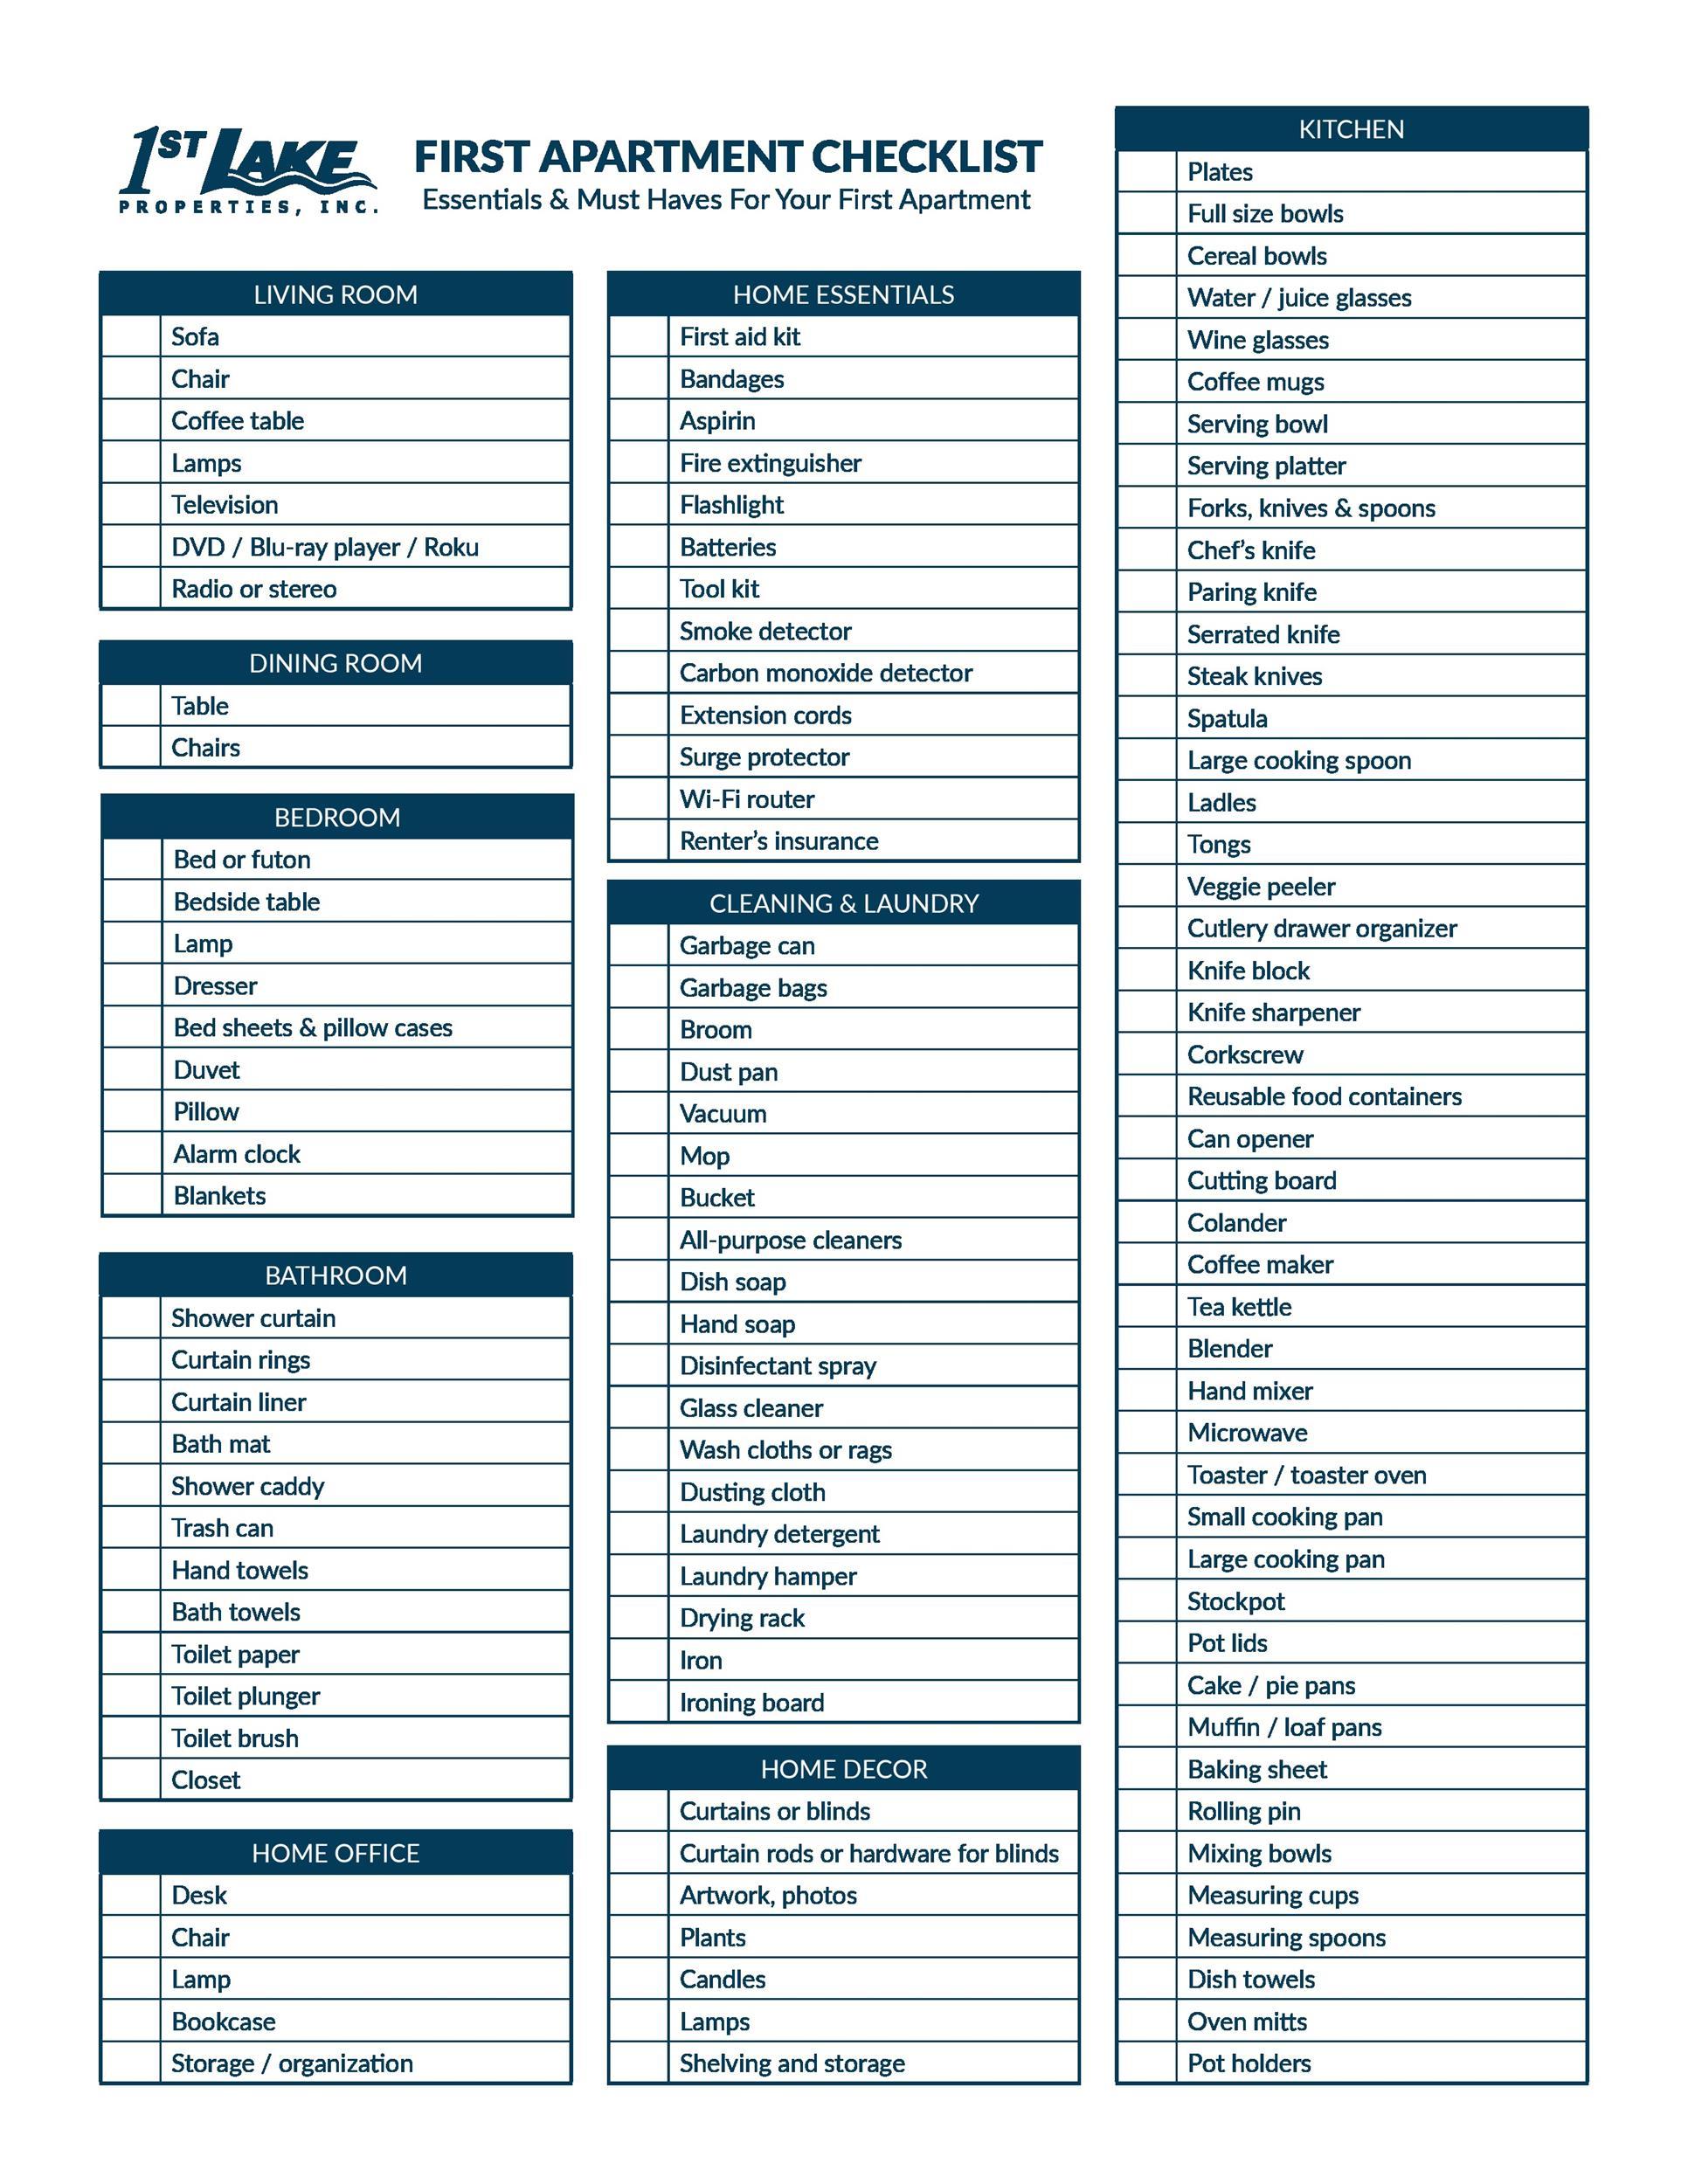 Free apartment checklist 34